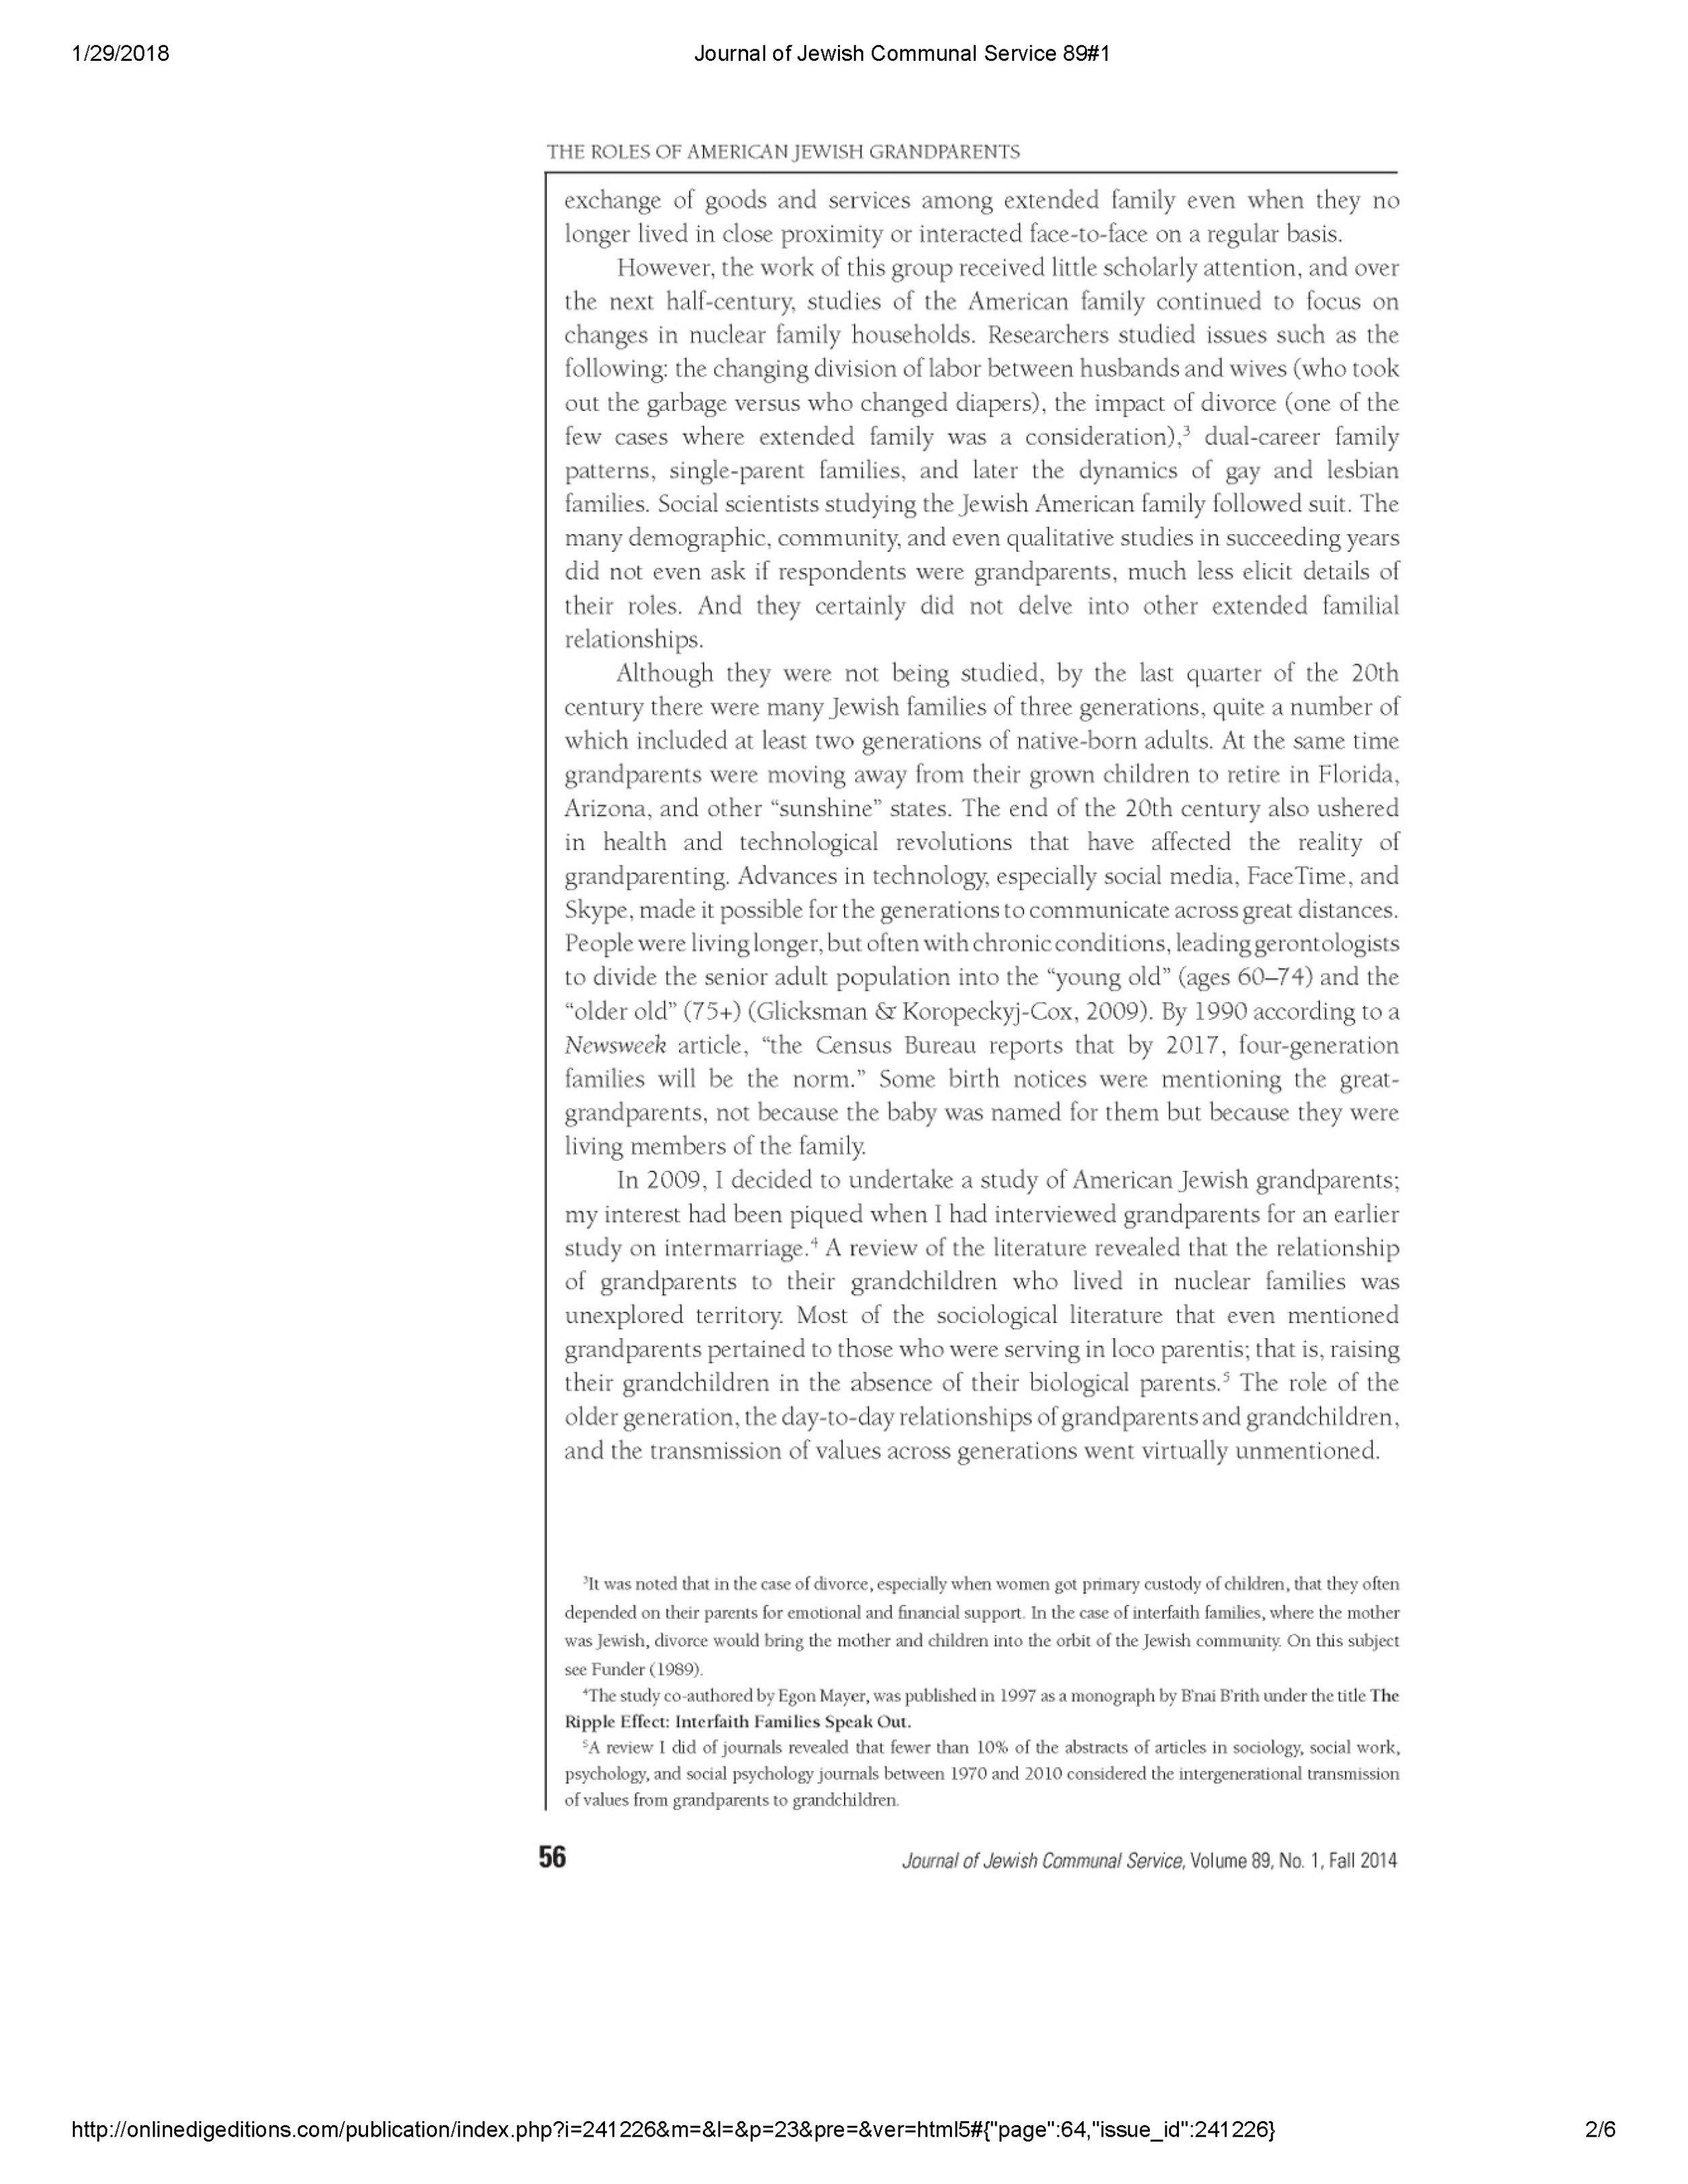 Journal of Jewish Communal Service 89#1_Page_2.jpg